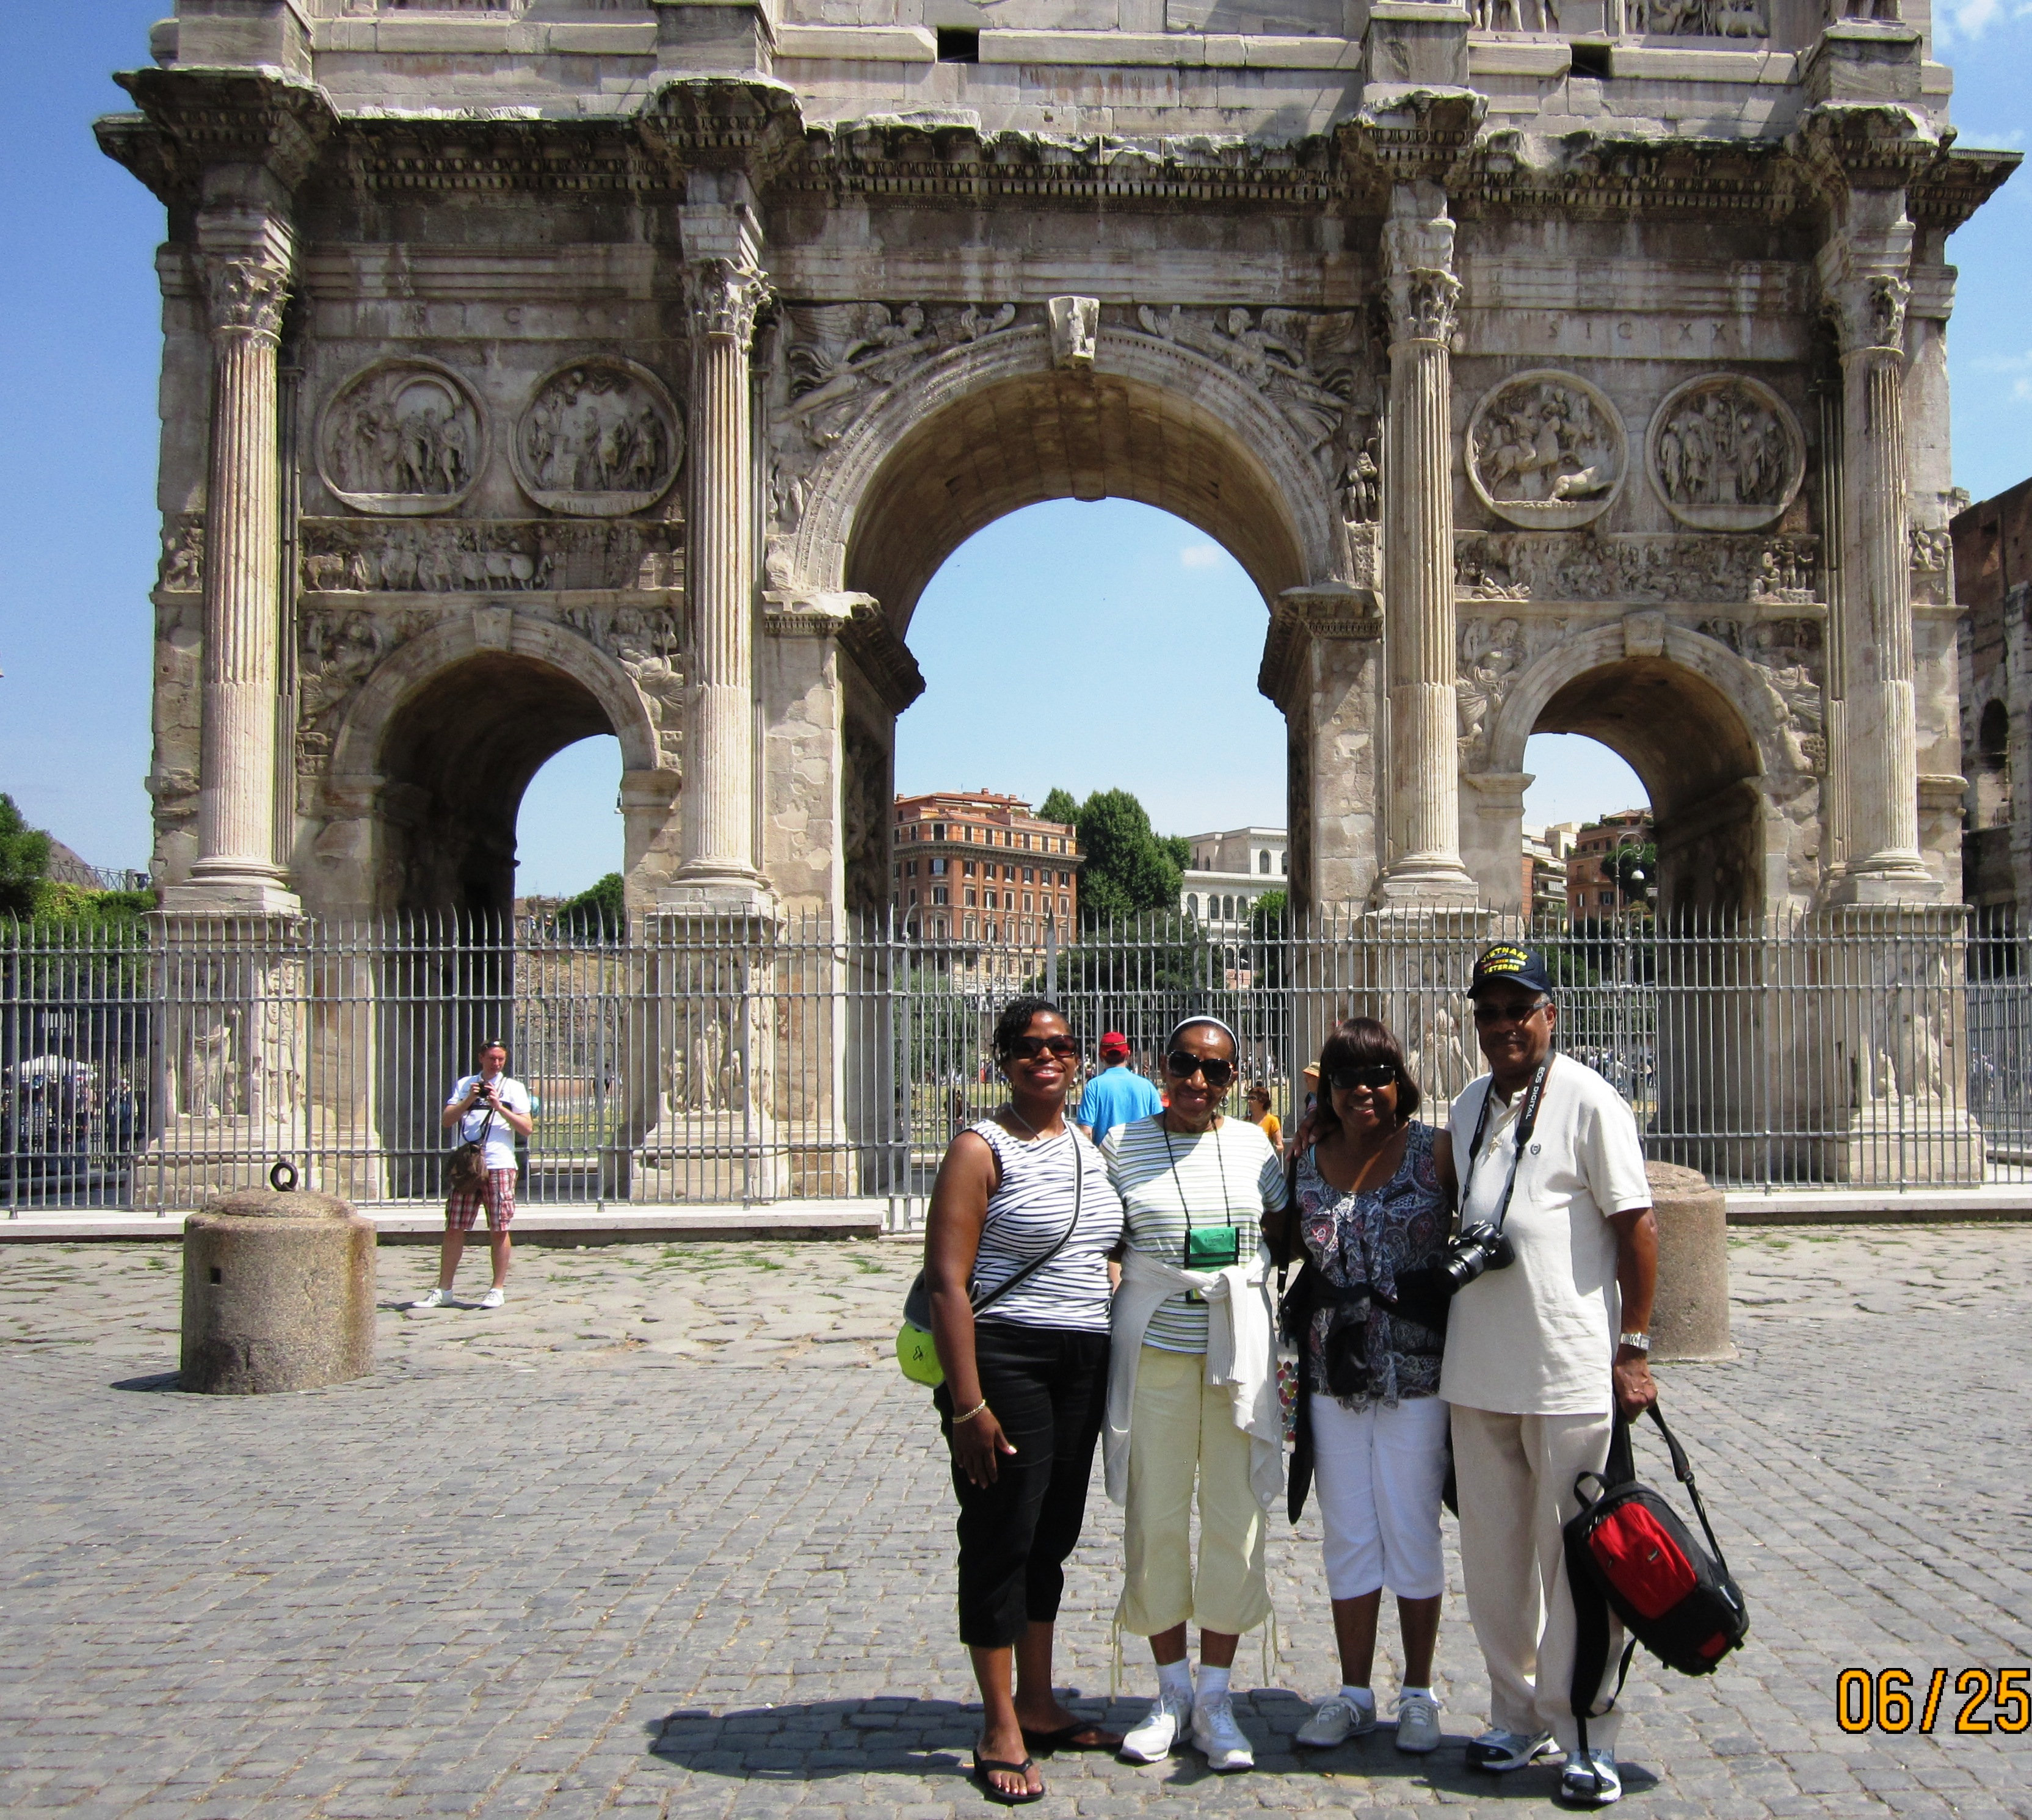 Coliseum, Rome Italy - European Crui